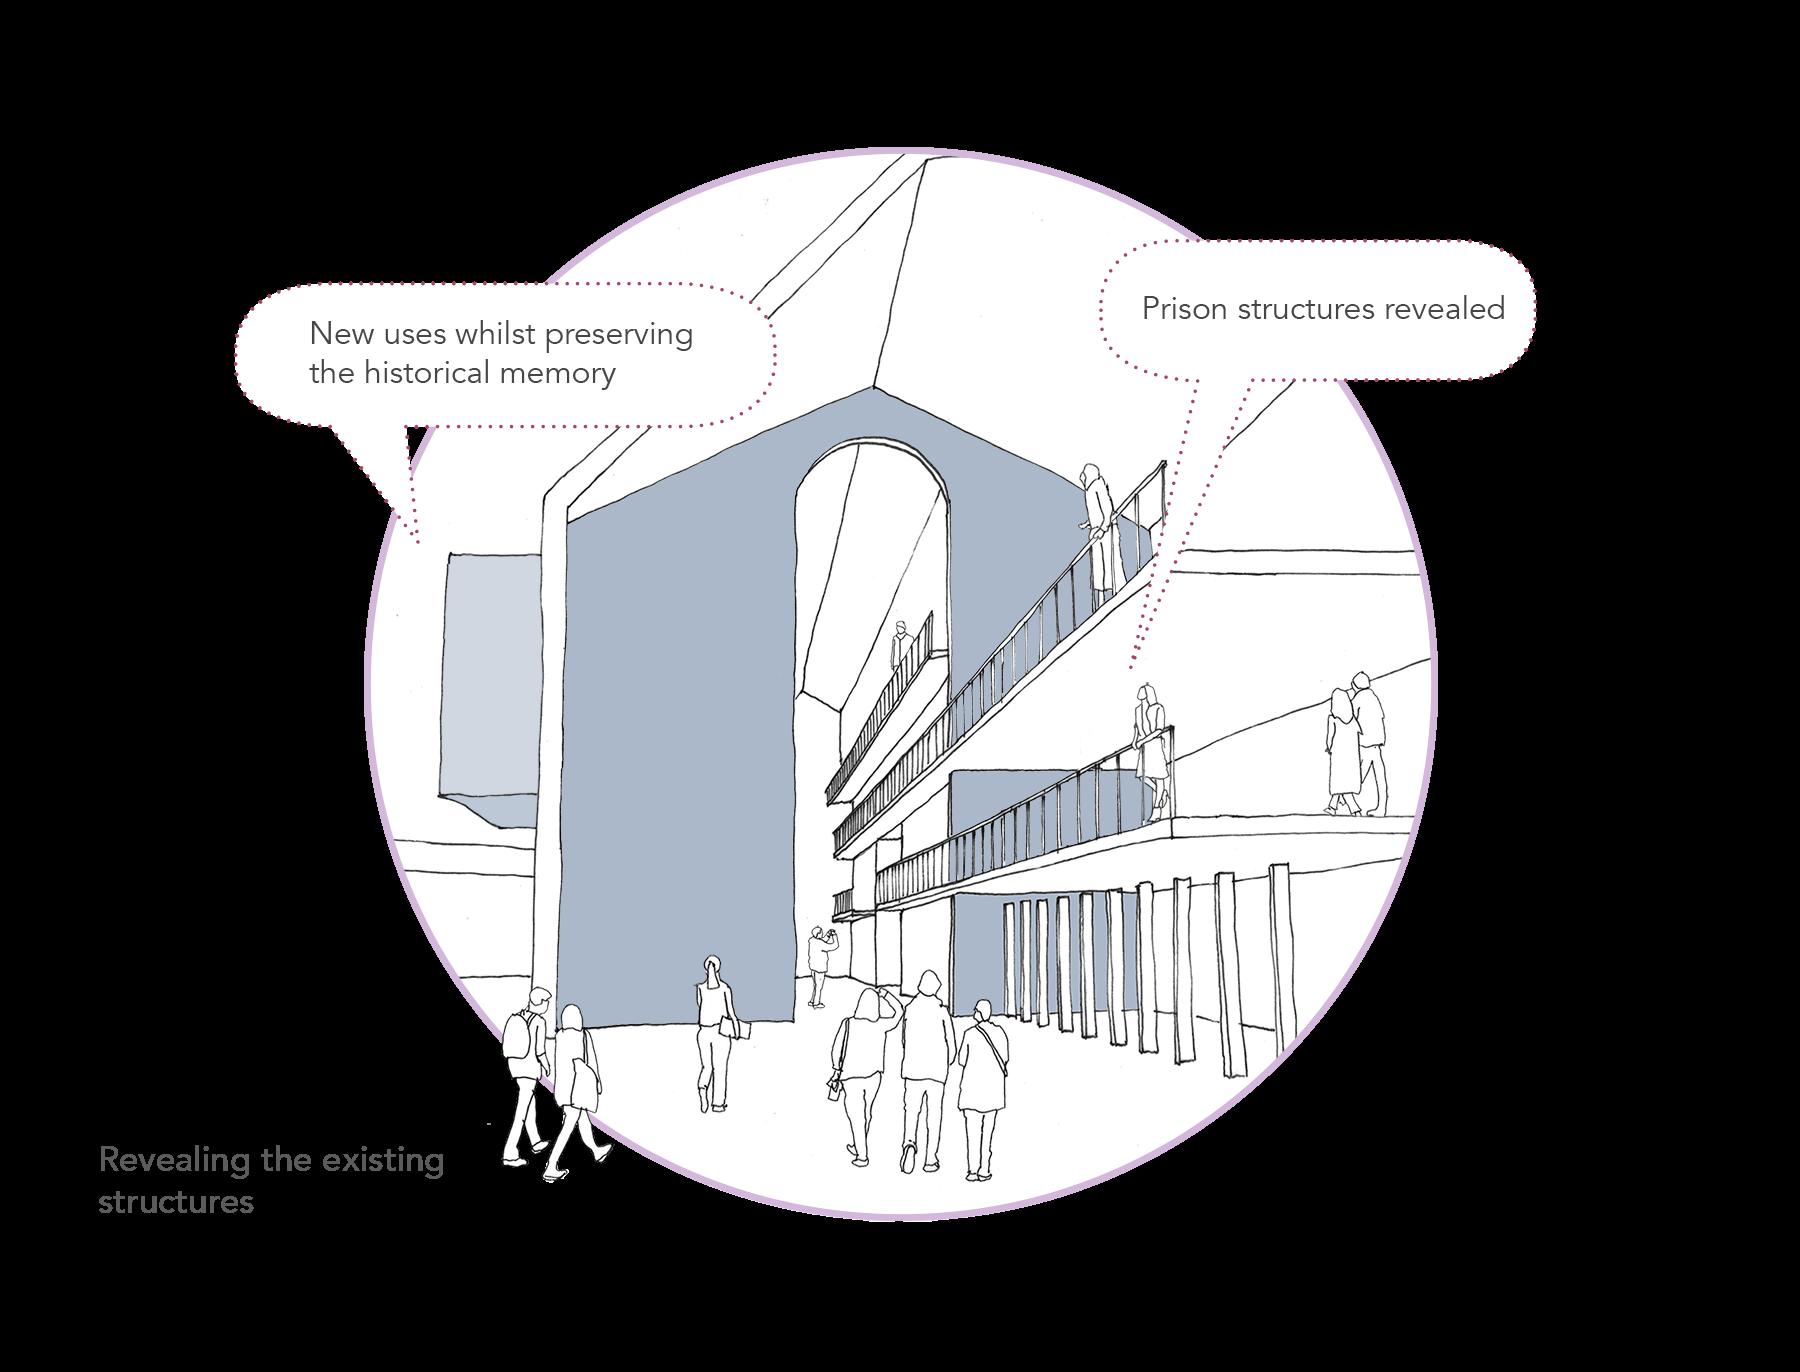 Sarah-Wigglesworth-Architects Unlocking-Pentonville Strategy-Memory Diagram 1800